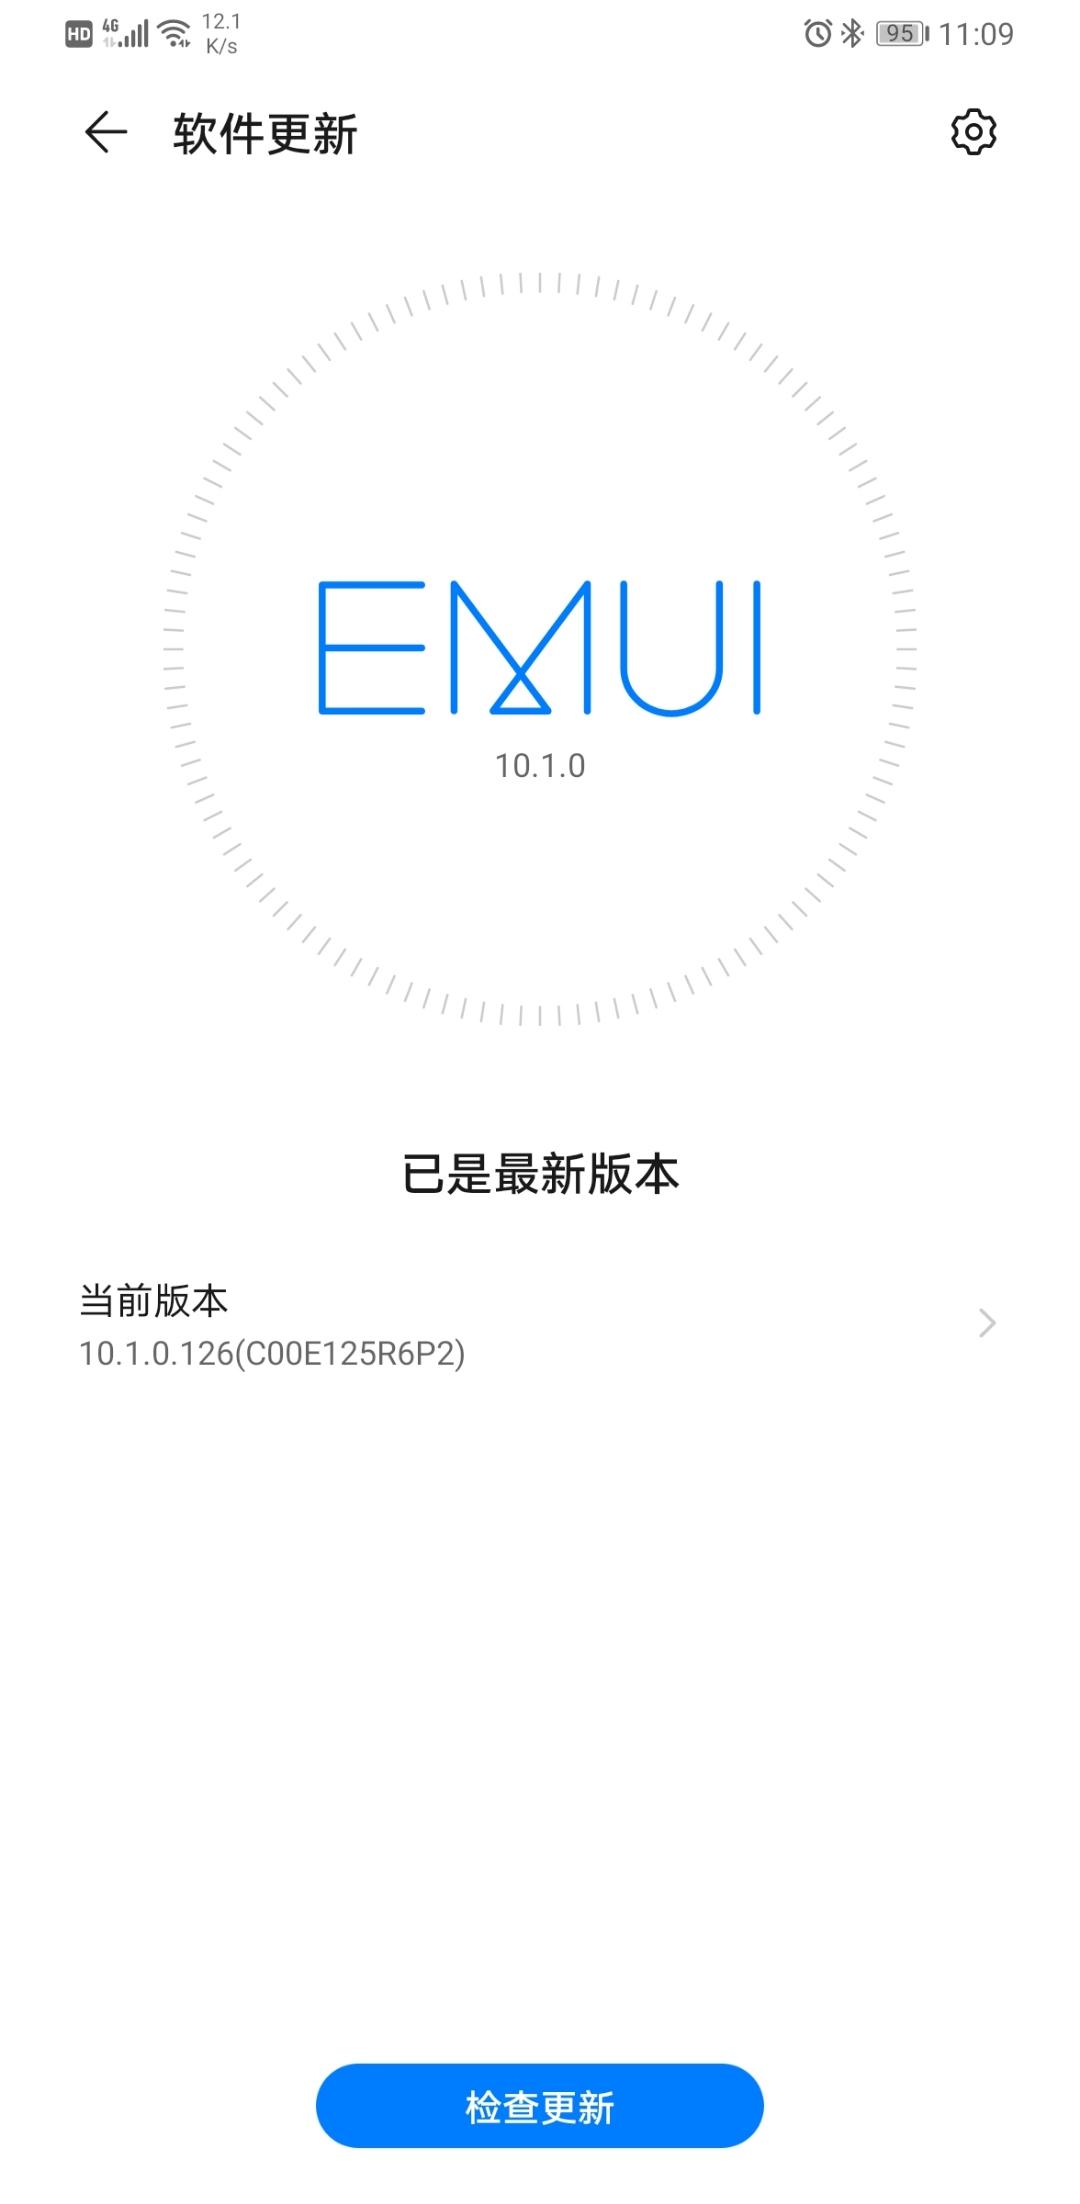 Screenshot_20200514_110907_com.huawei.android.hwouc.jpg